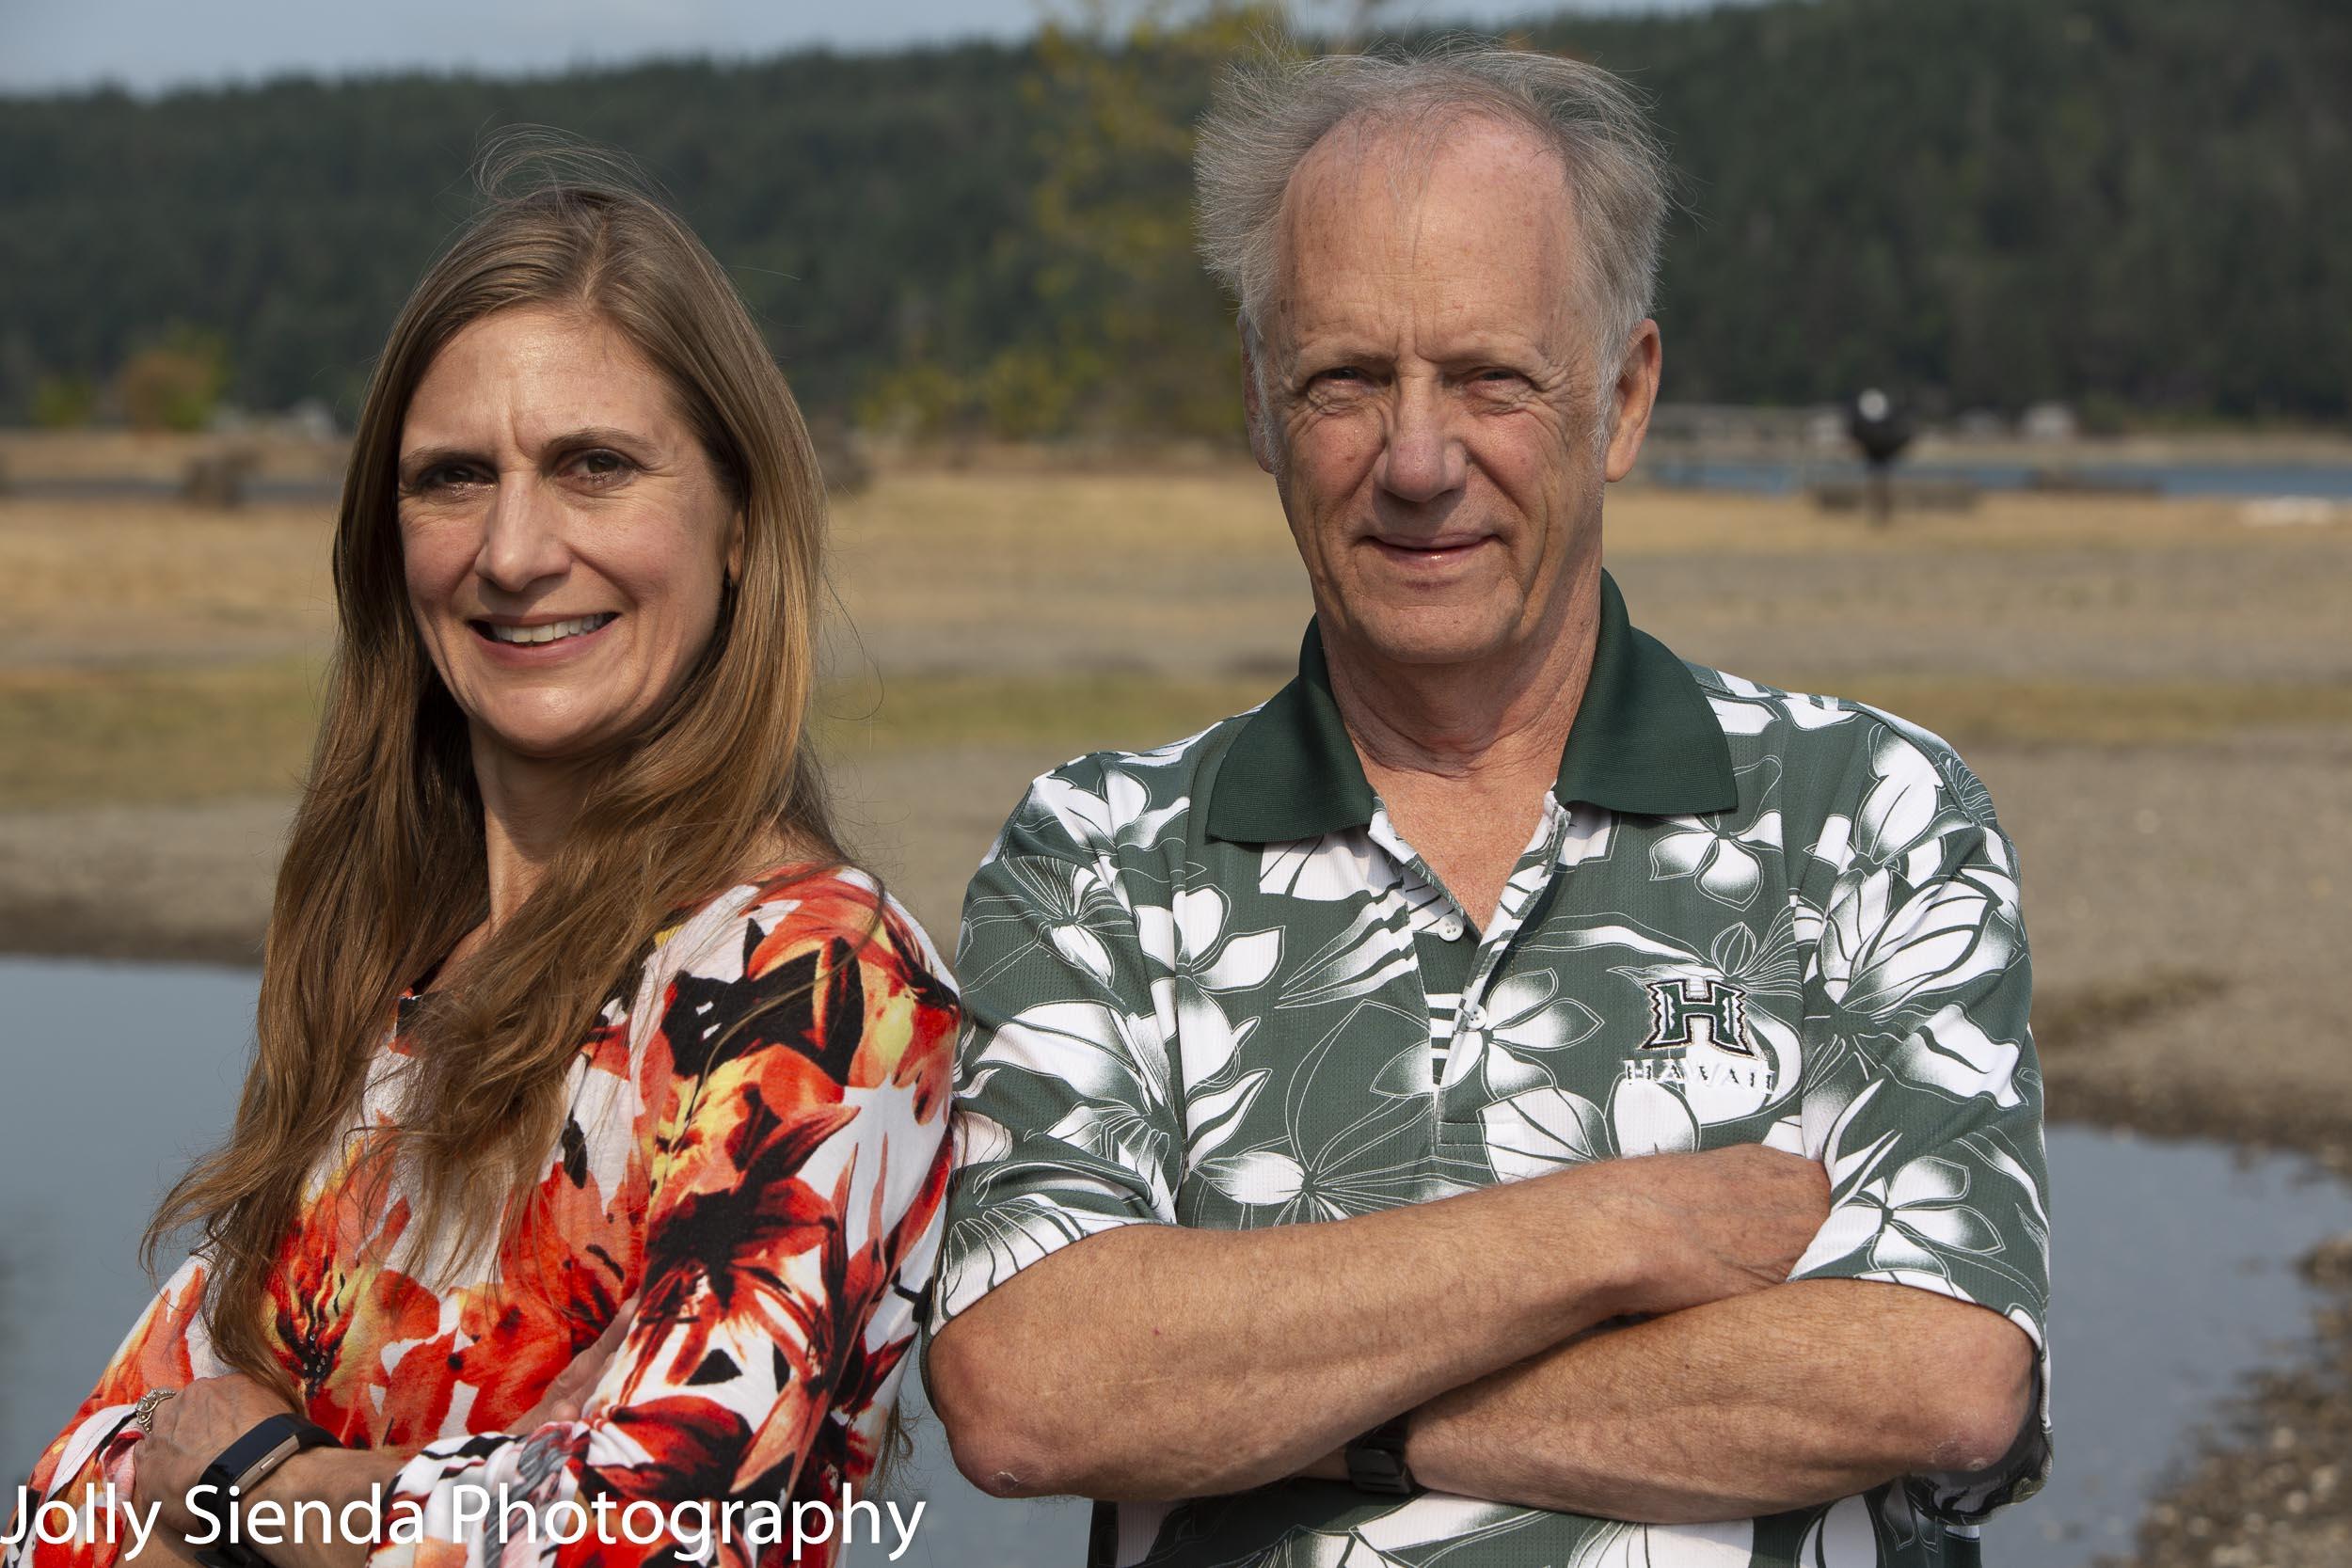 Cathy Darlington Graham and Ron Jenson, Business portrait photog